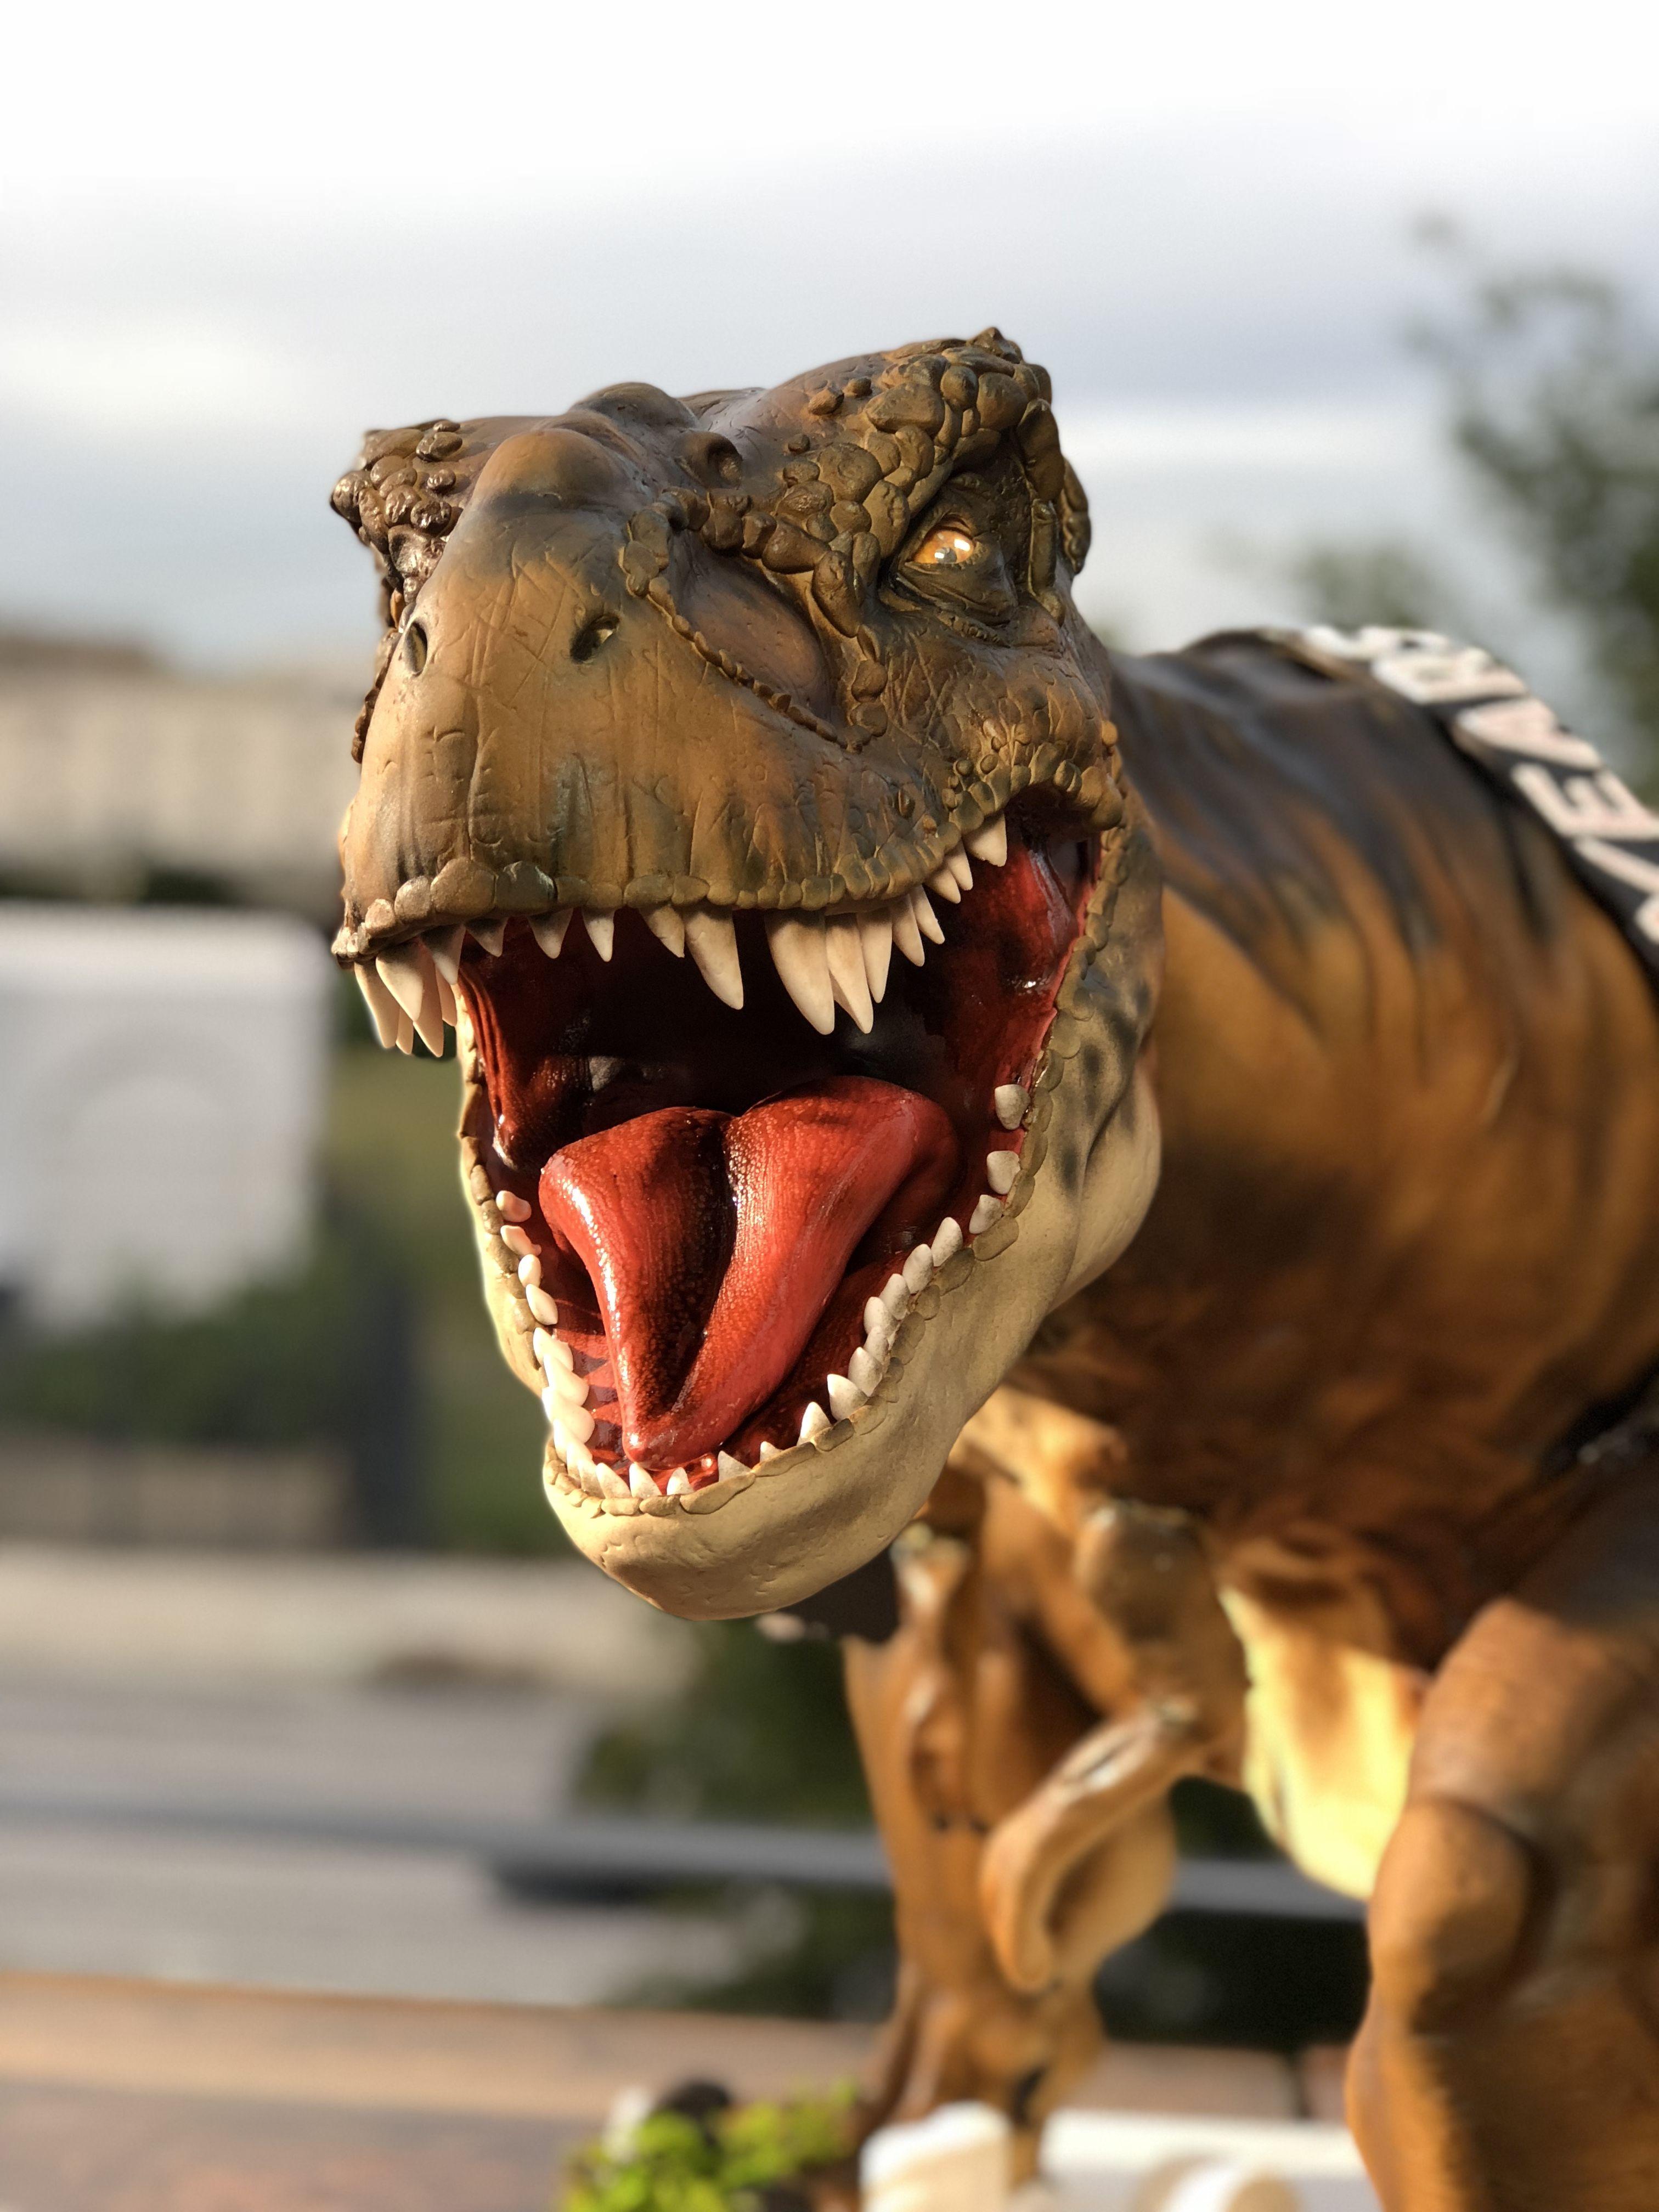 Awesome Jurassic Park Fallen World Cake T Rex By Thelondonbaker Prime 1 Studio Tyrannosaurus 1993 15 Thelondonbakercom